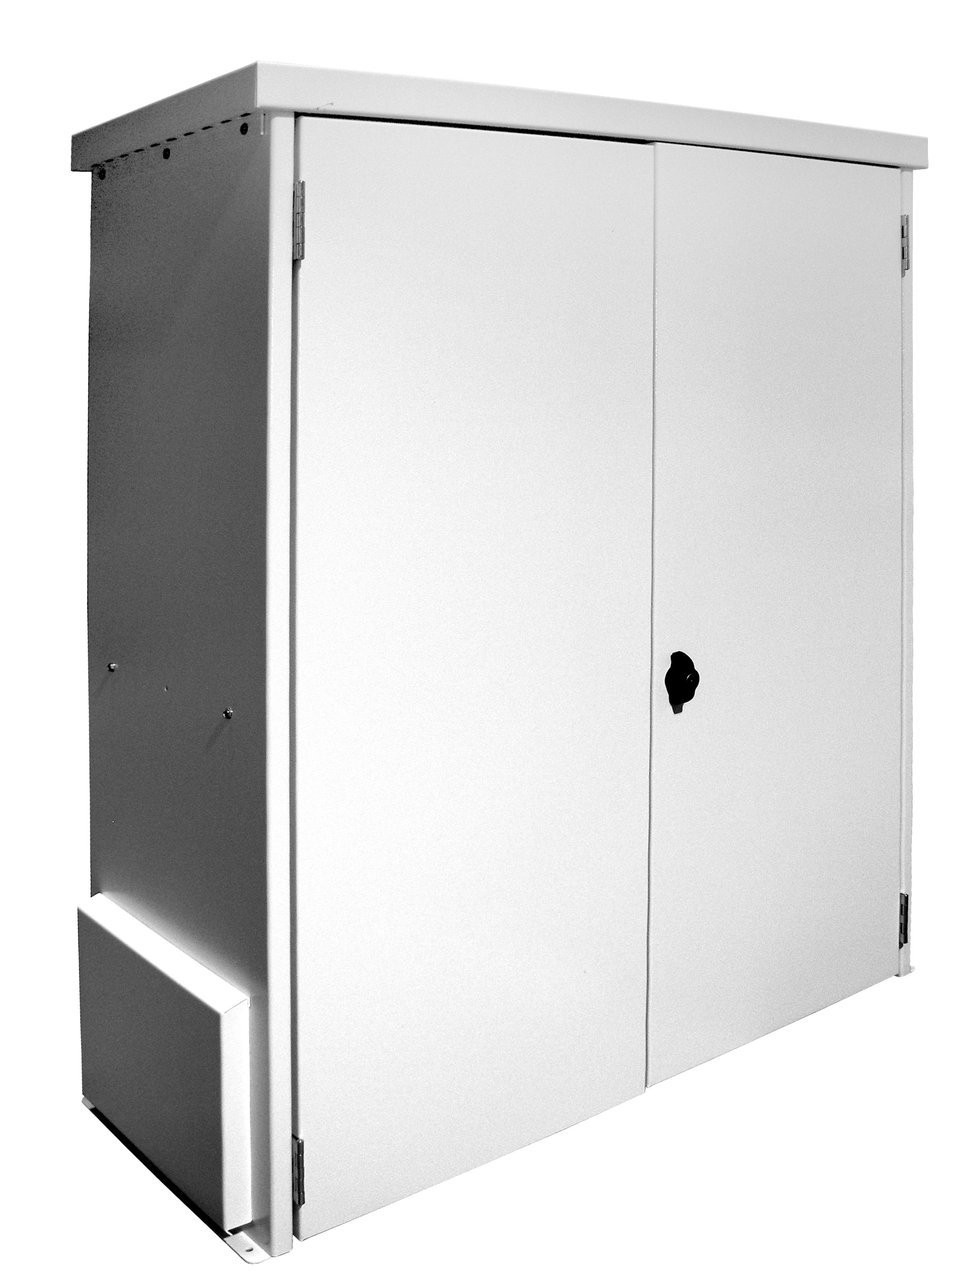 MNBE-D MidNite Solar Battery Enclosure